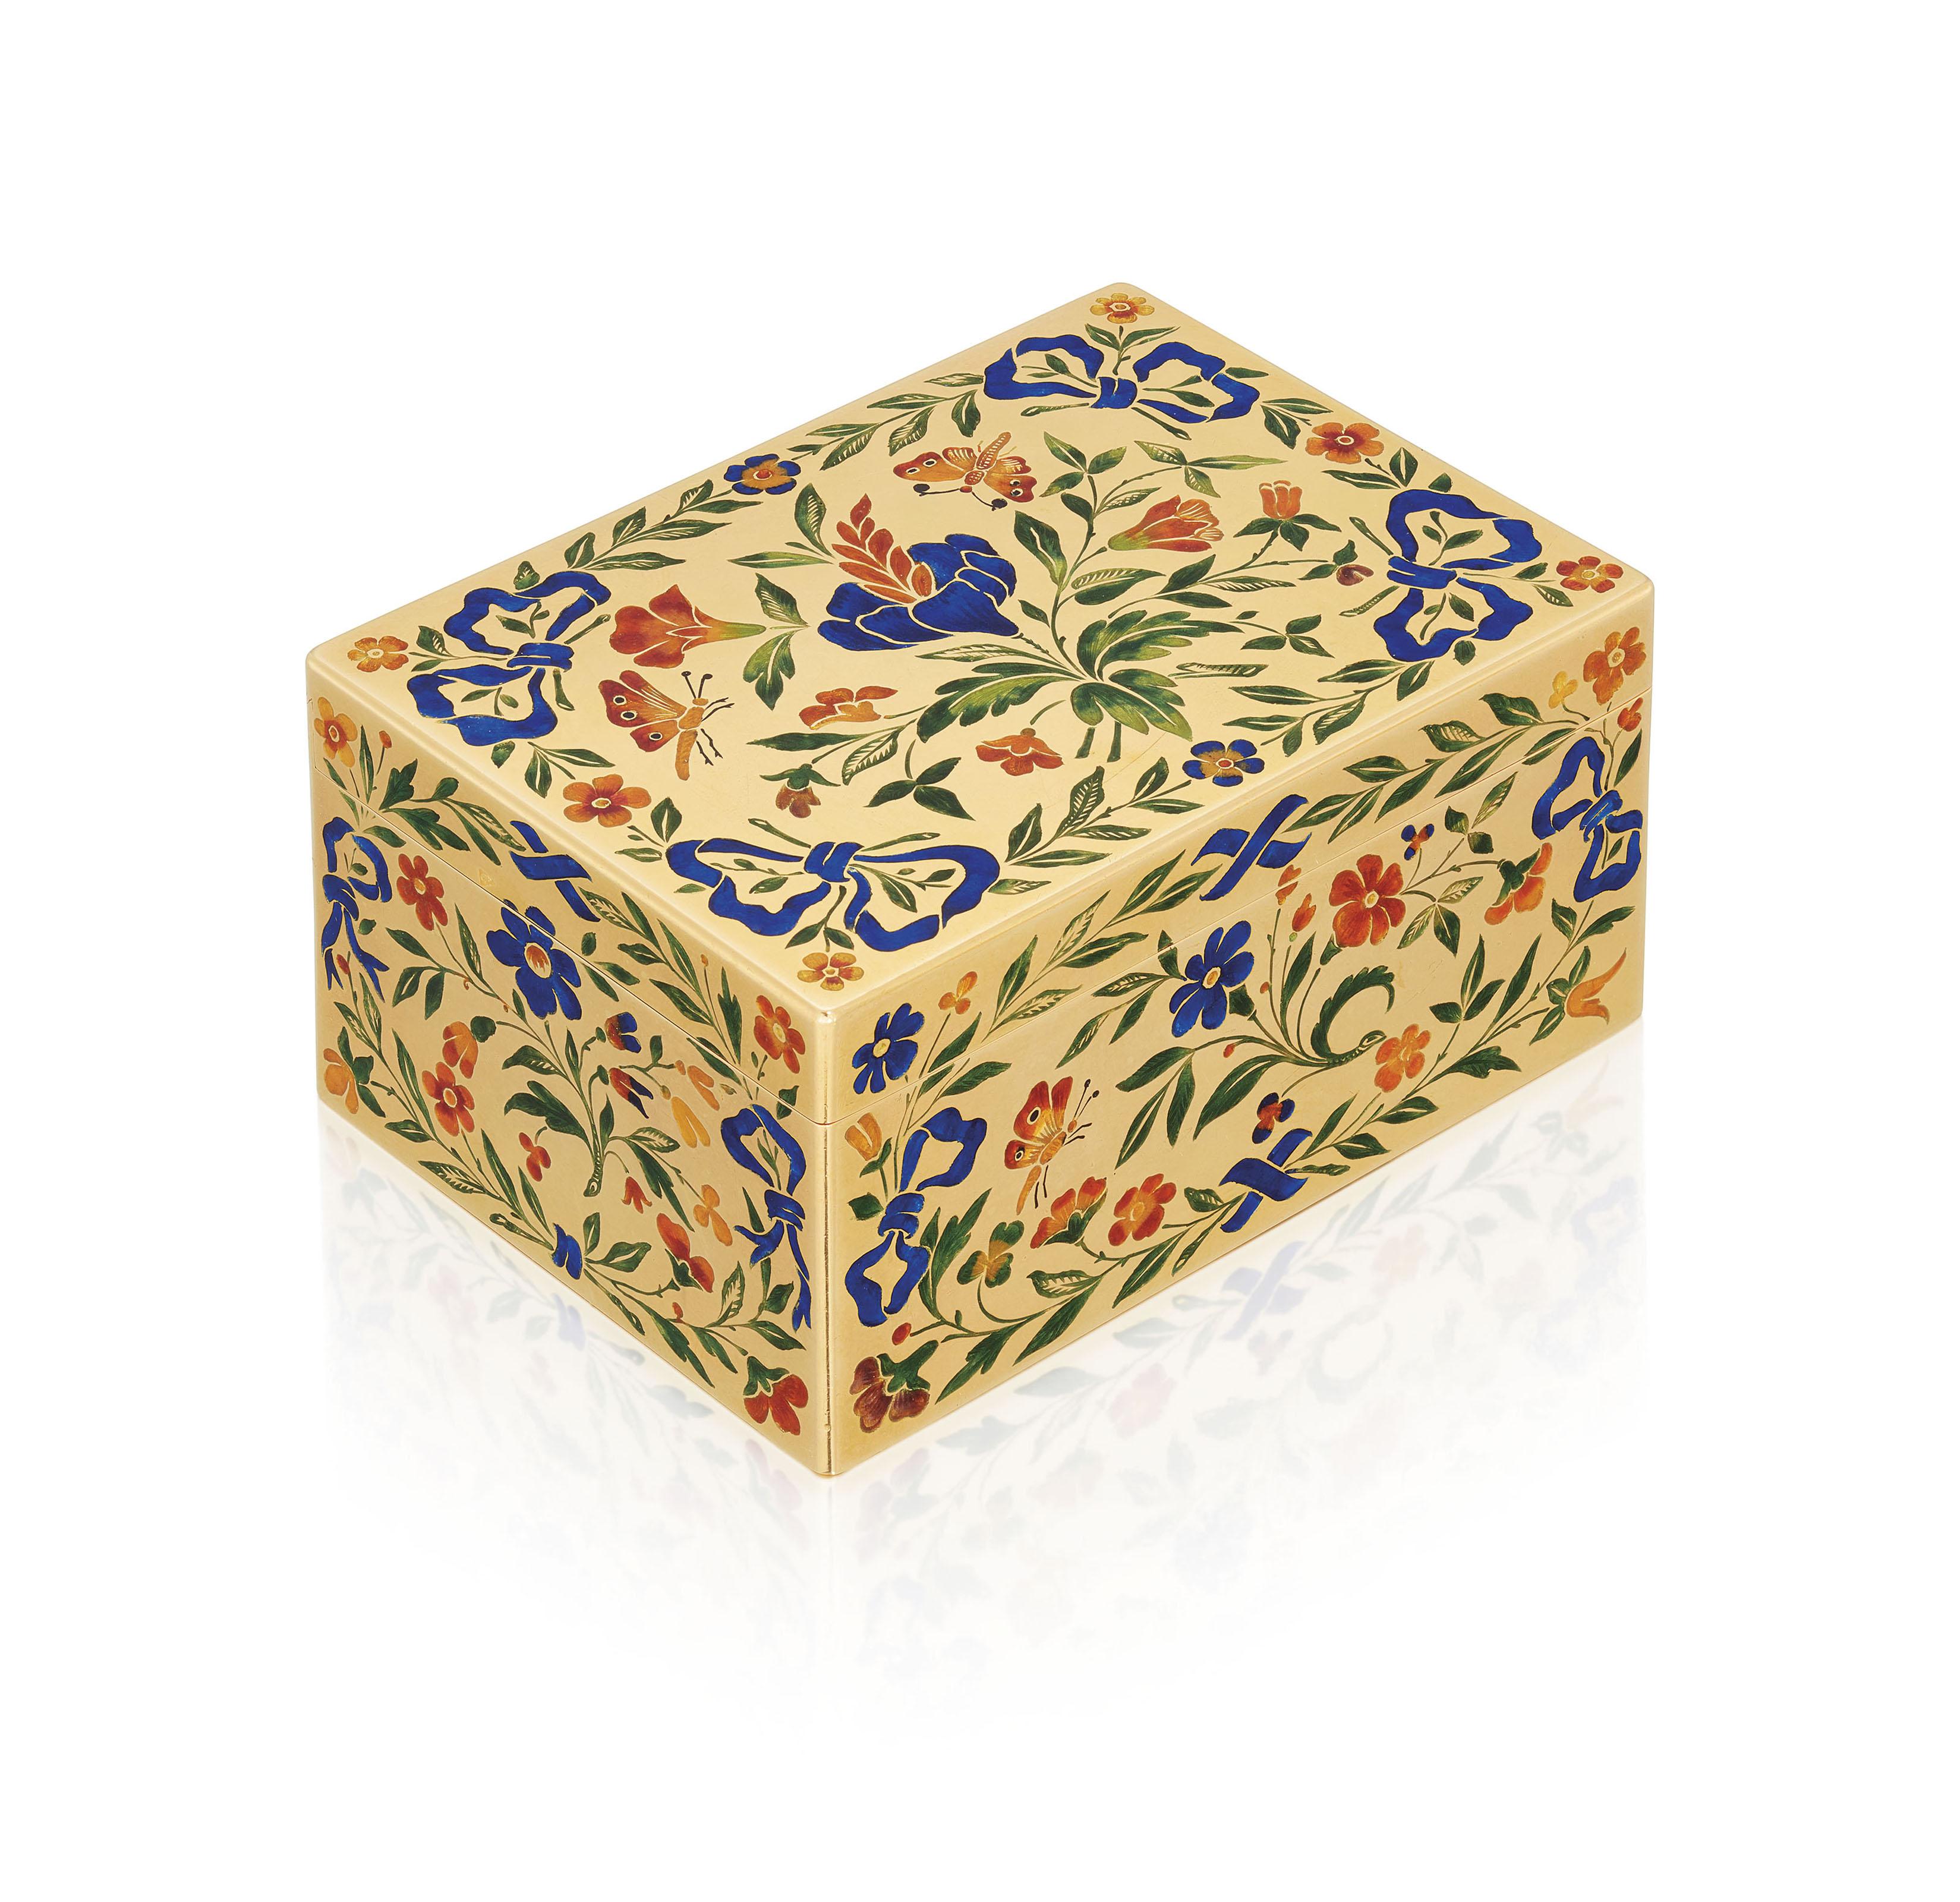 A SWISS OR GERMAN ENAMELLED GOLD SNUFF-BOX